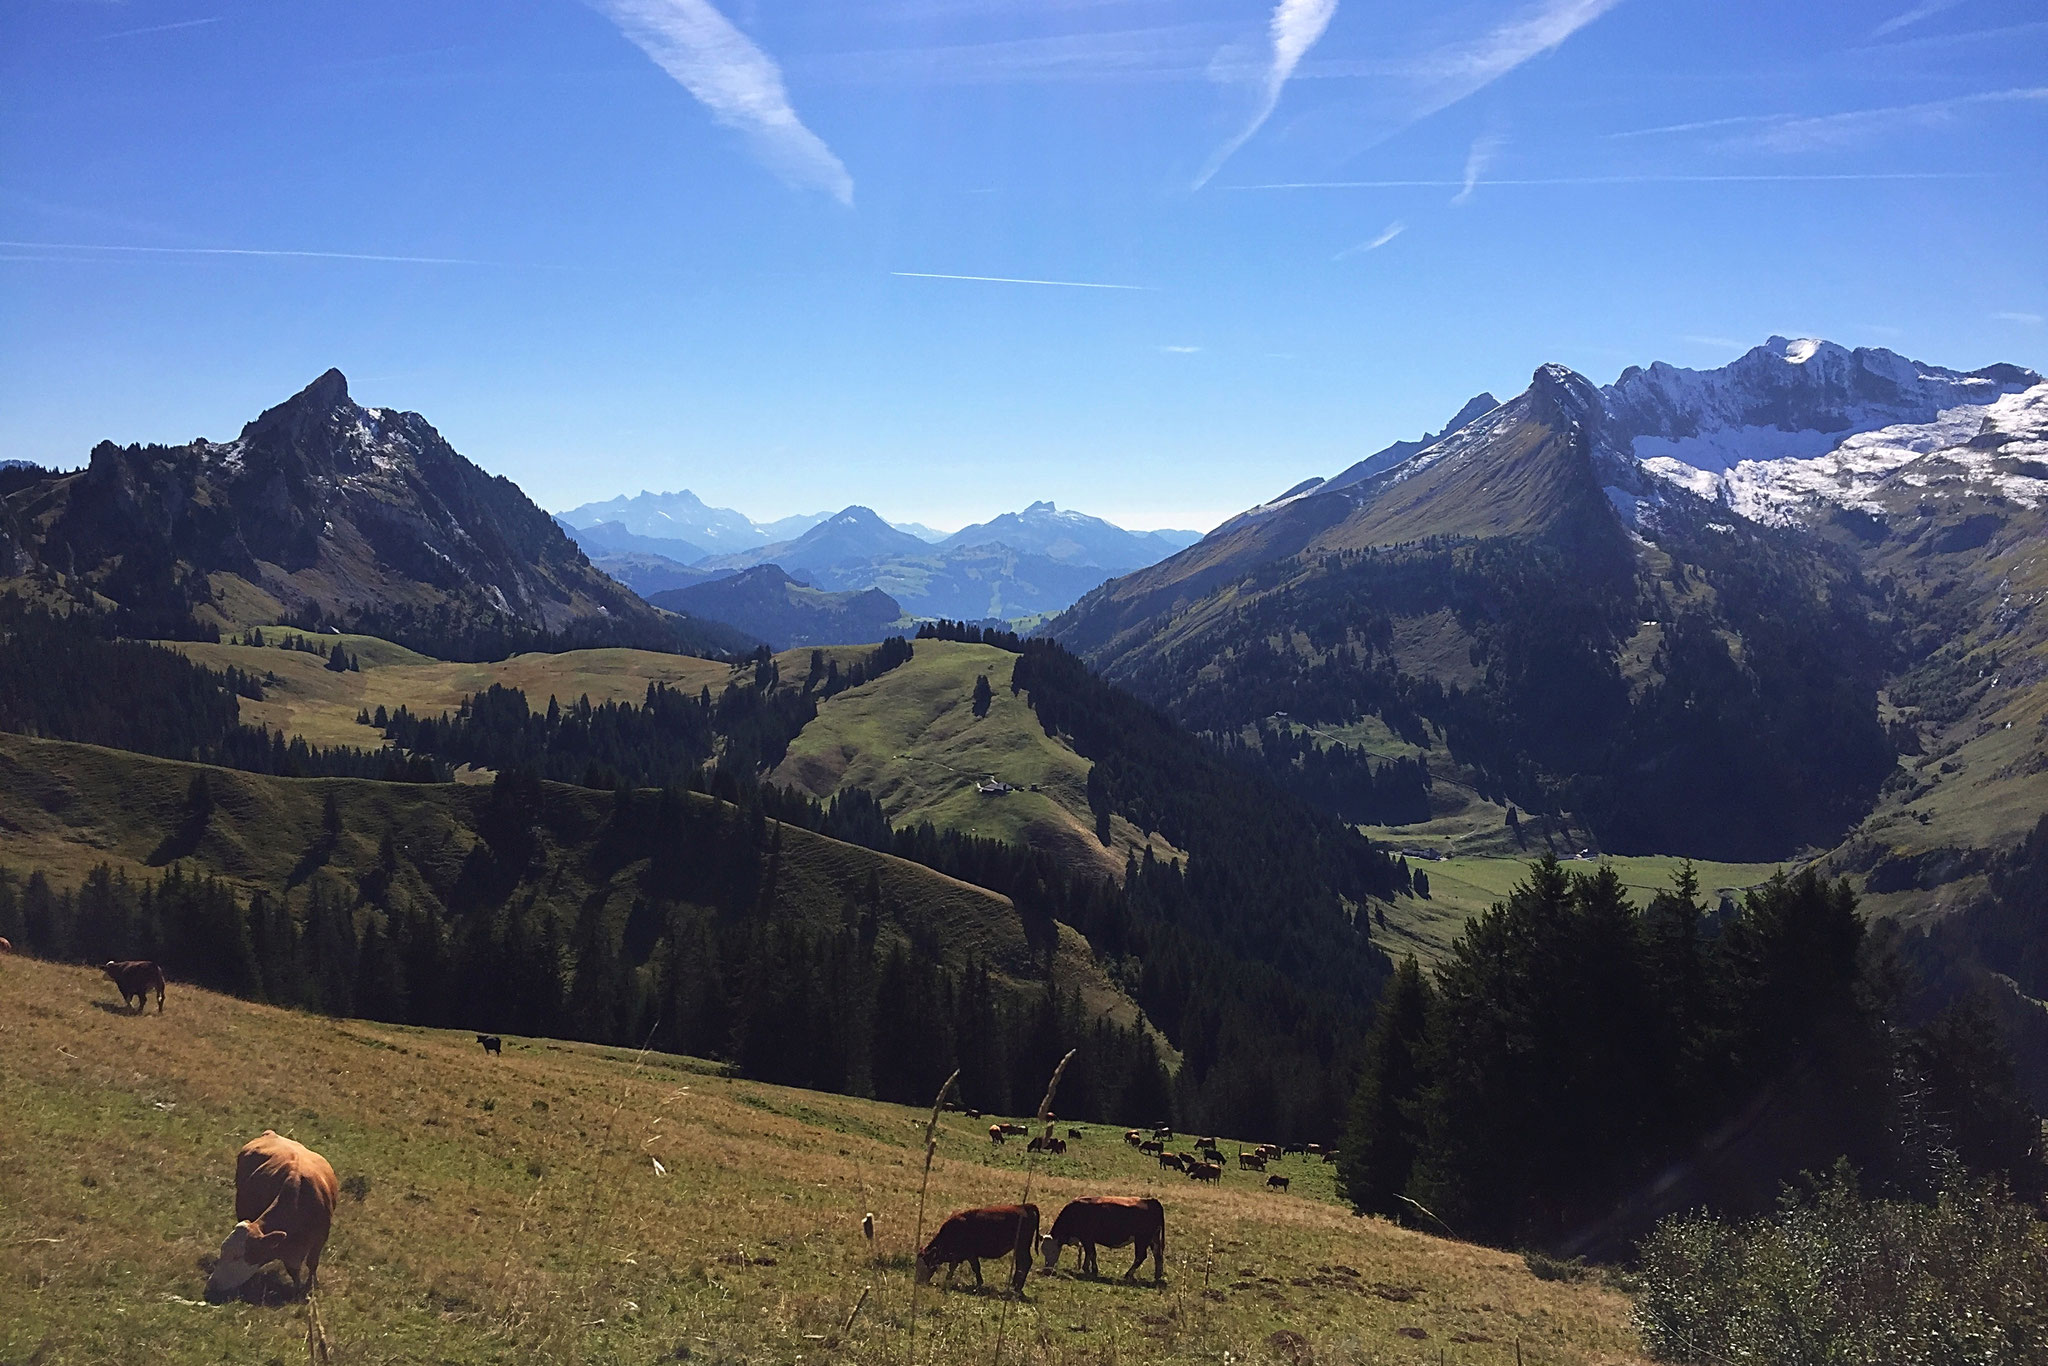 Alp Pralet